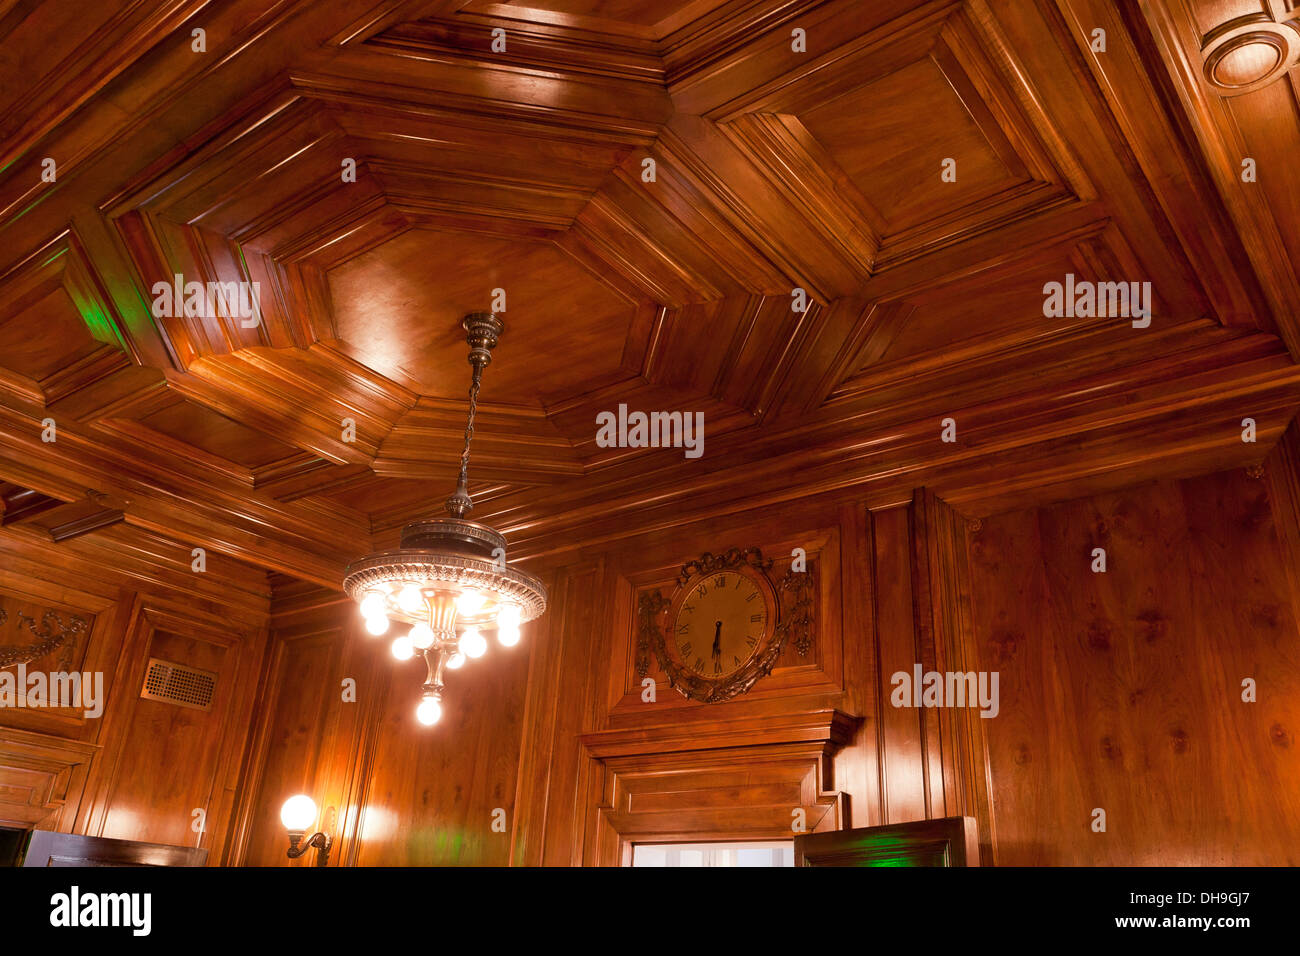 Wood Panel Ceiling Stock Photo Alamy